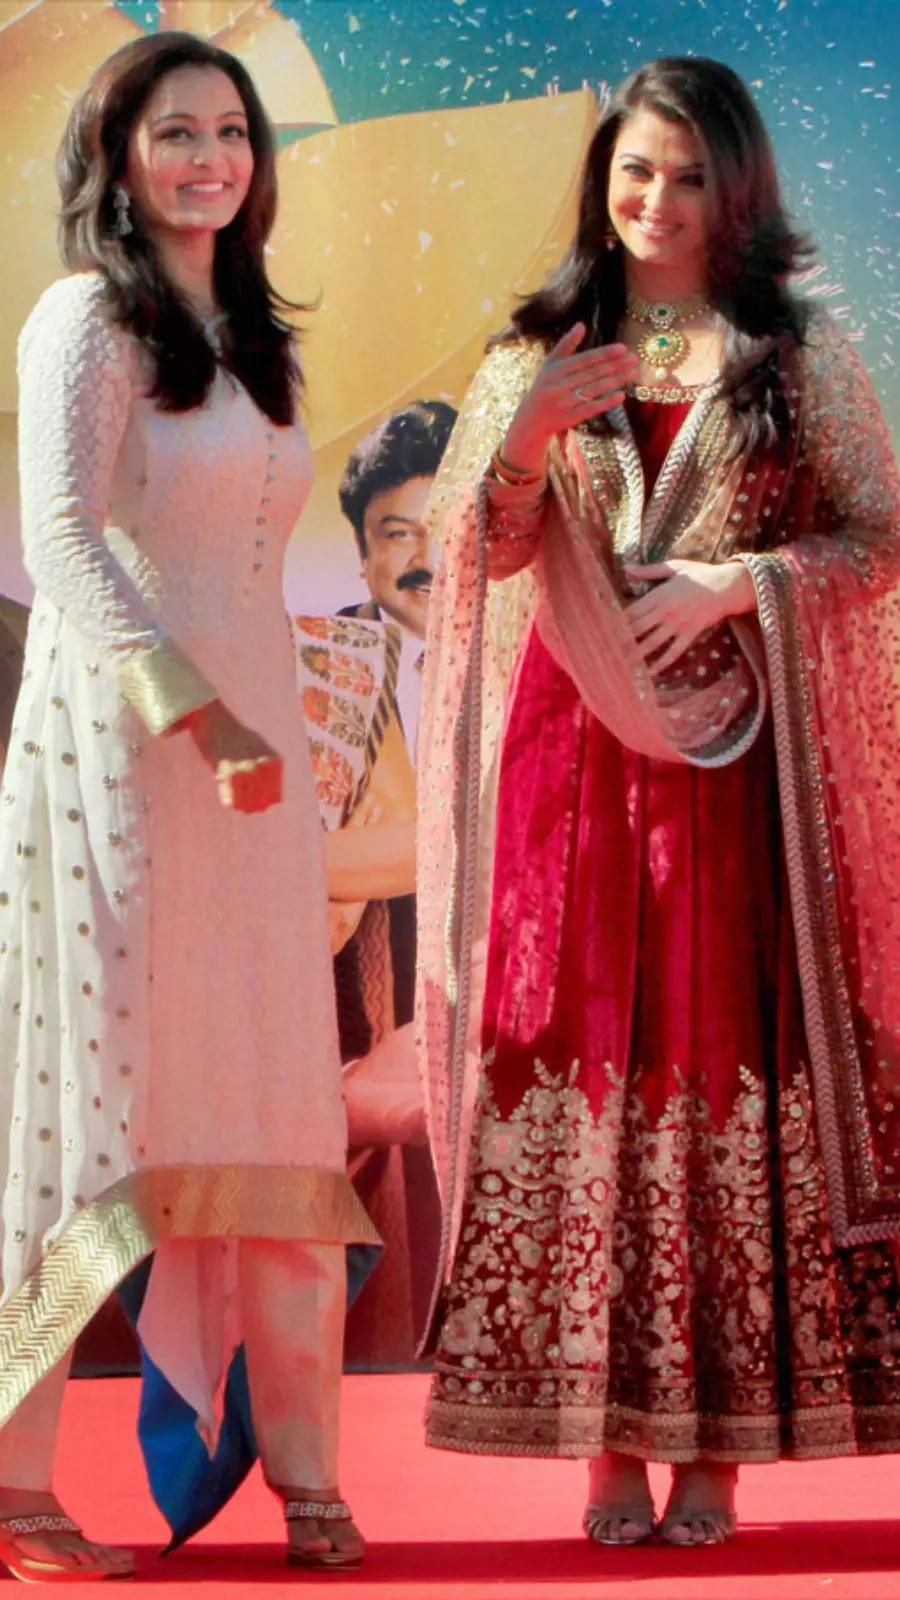 With Aishwarya Rai